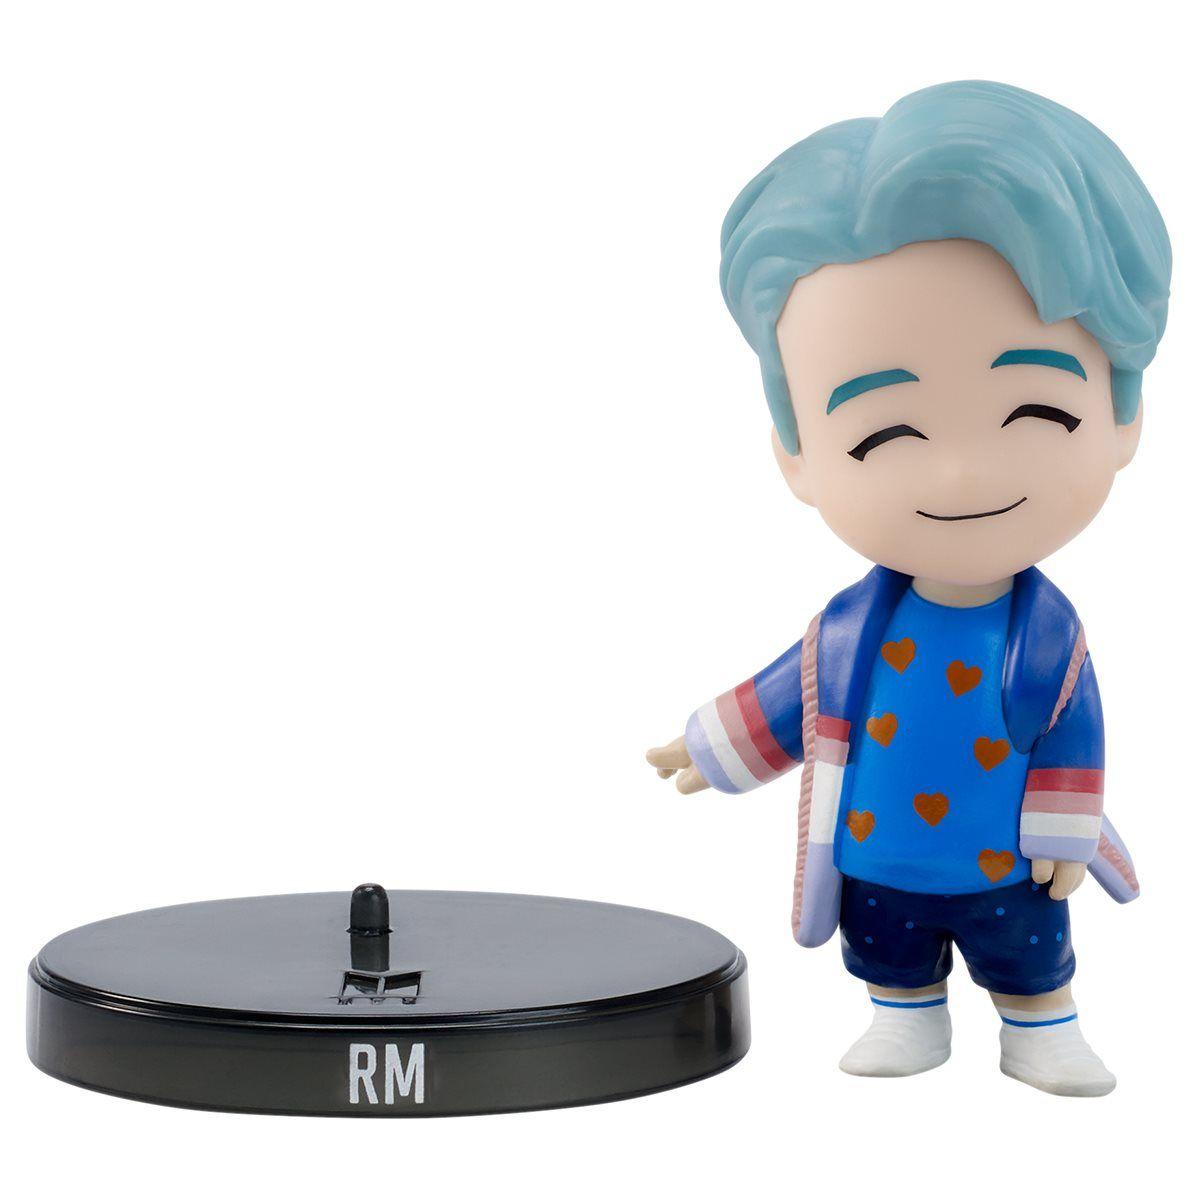 Bts Rm Vinyl Mini Vinyl Figure Entertainment Earth In 2020 Vinyl Figures Vinyl Mini